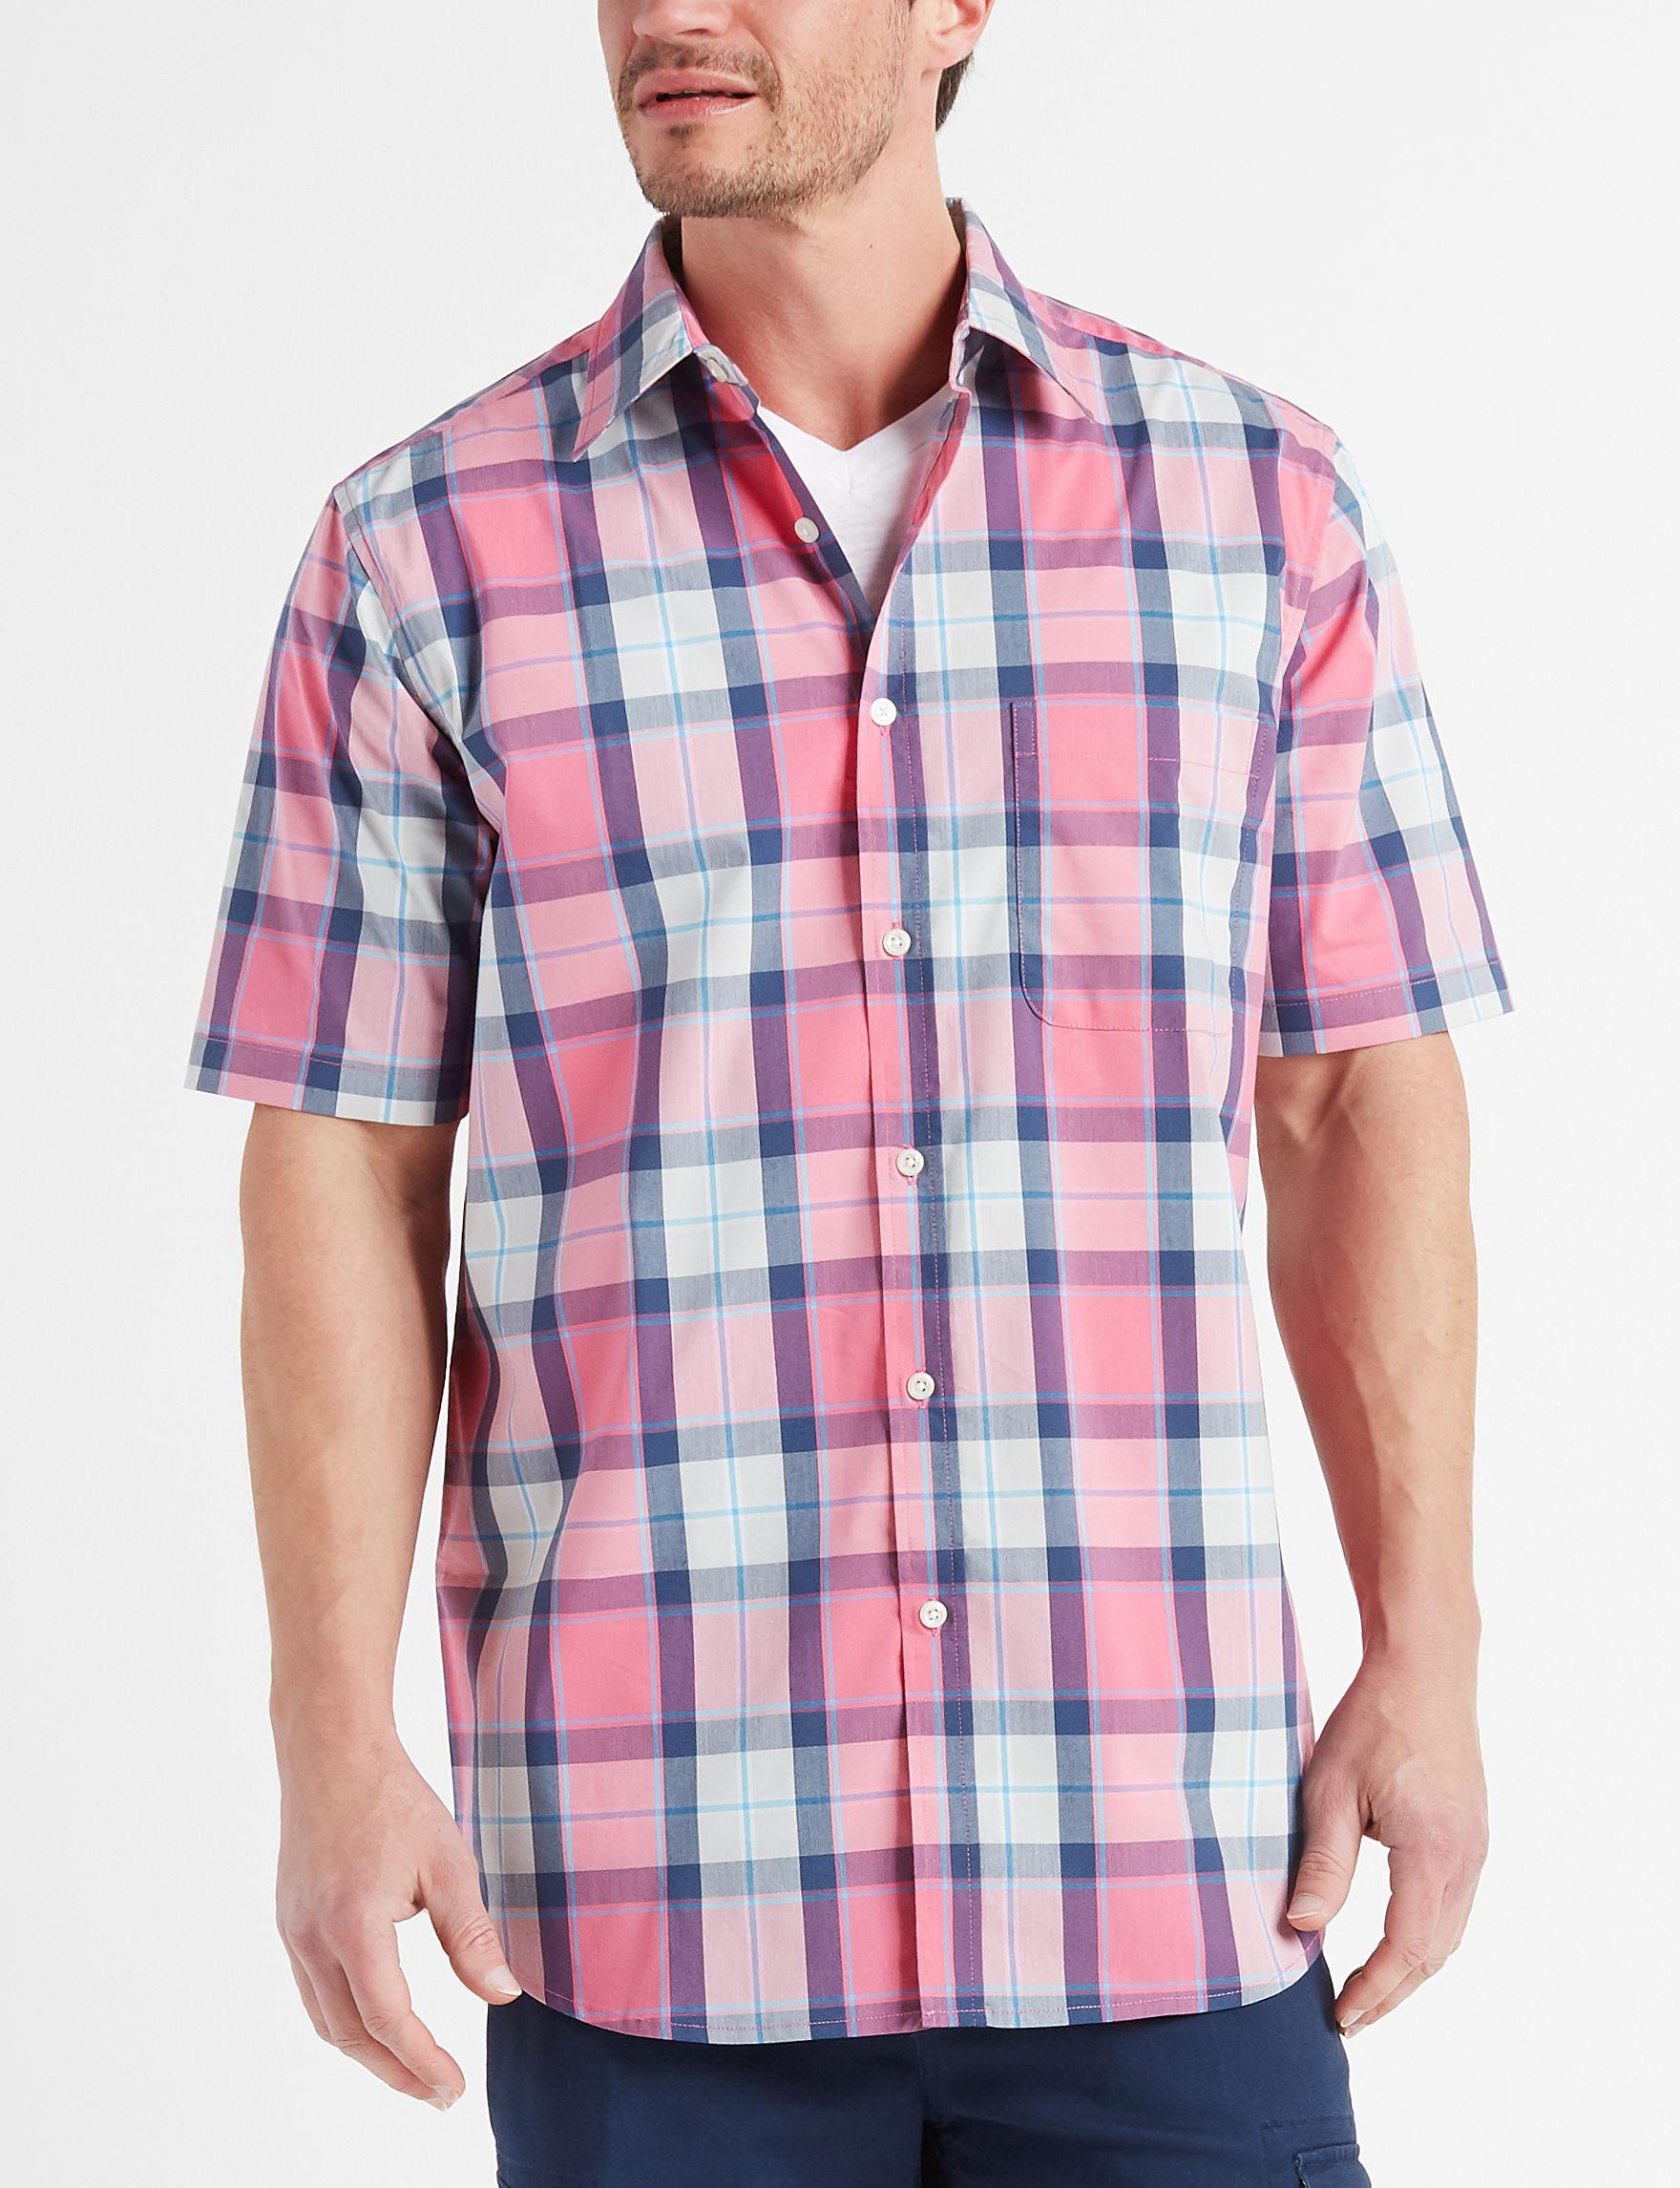 Sun River Pink Plaid Casual Button Down Shirts